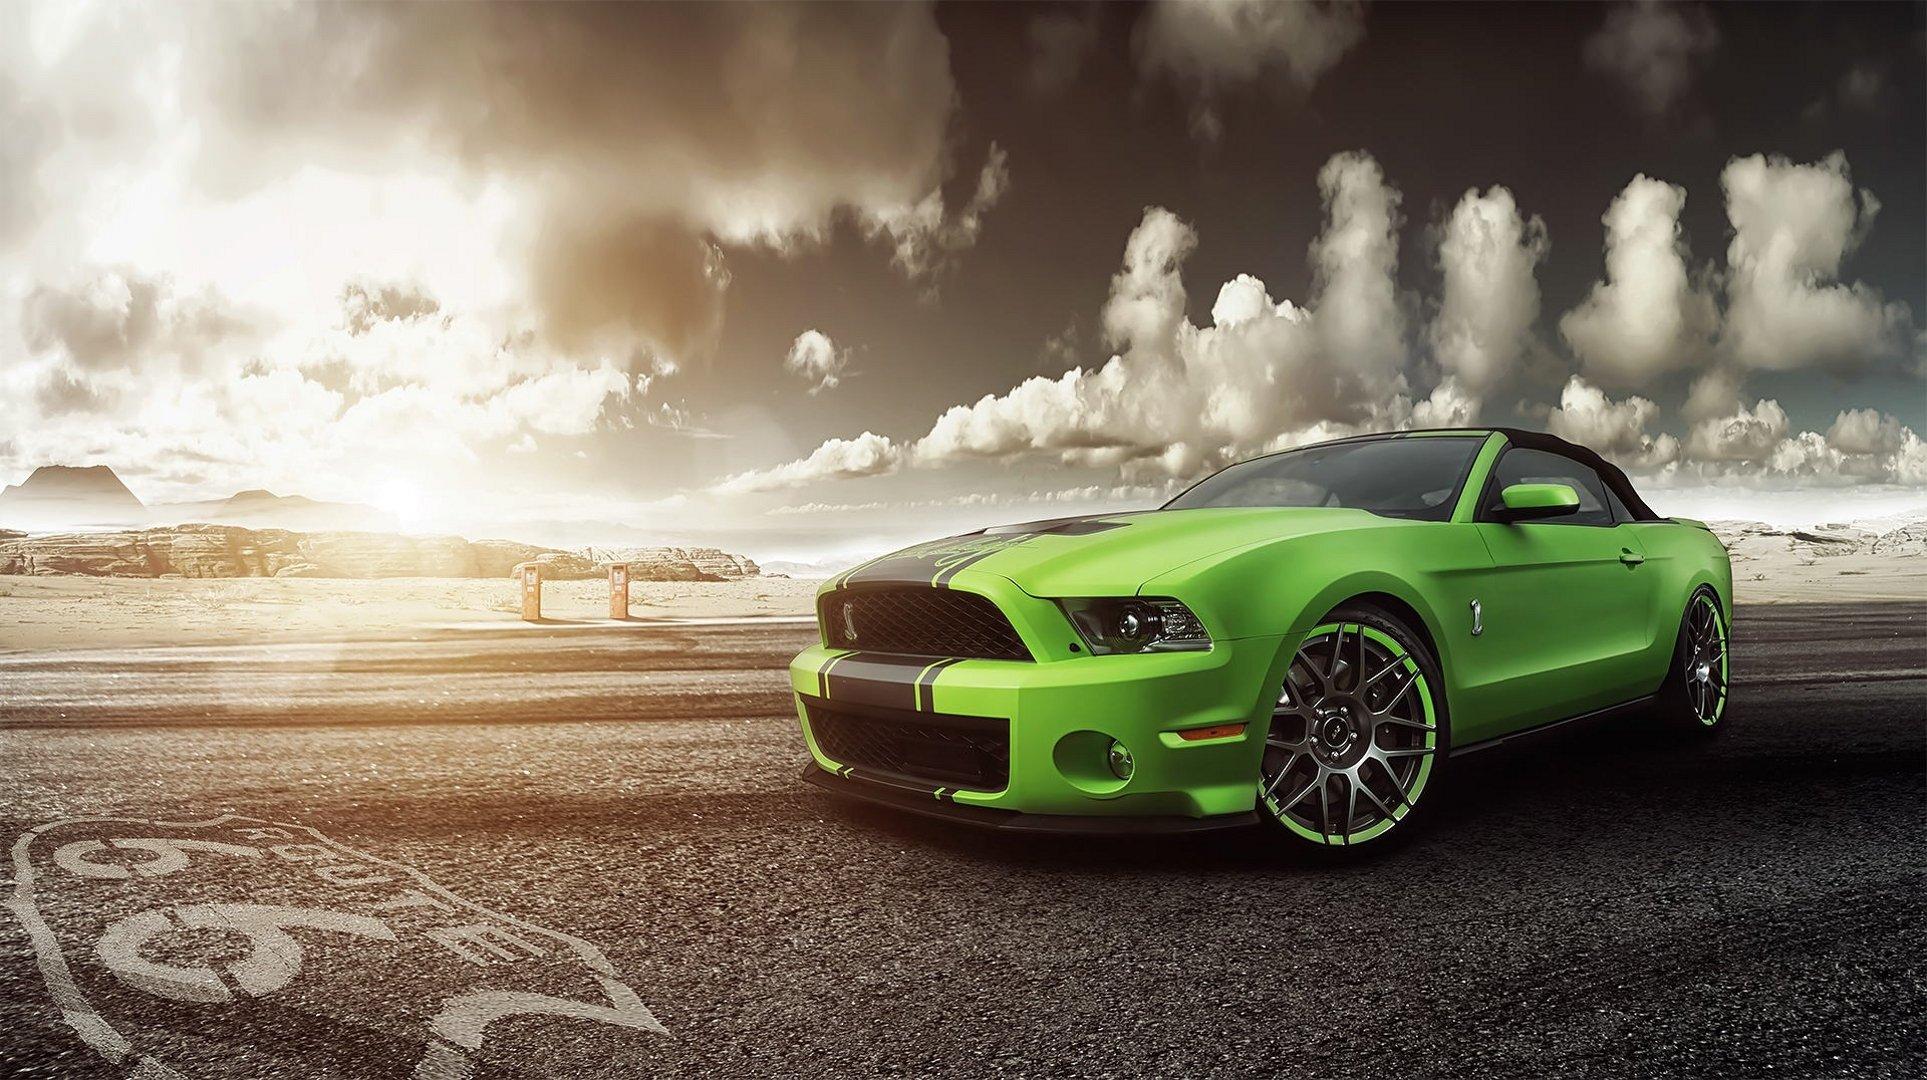 Ford Mustang дорога небо без смс